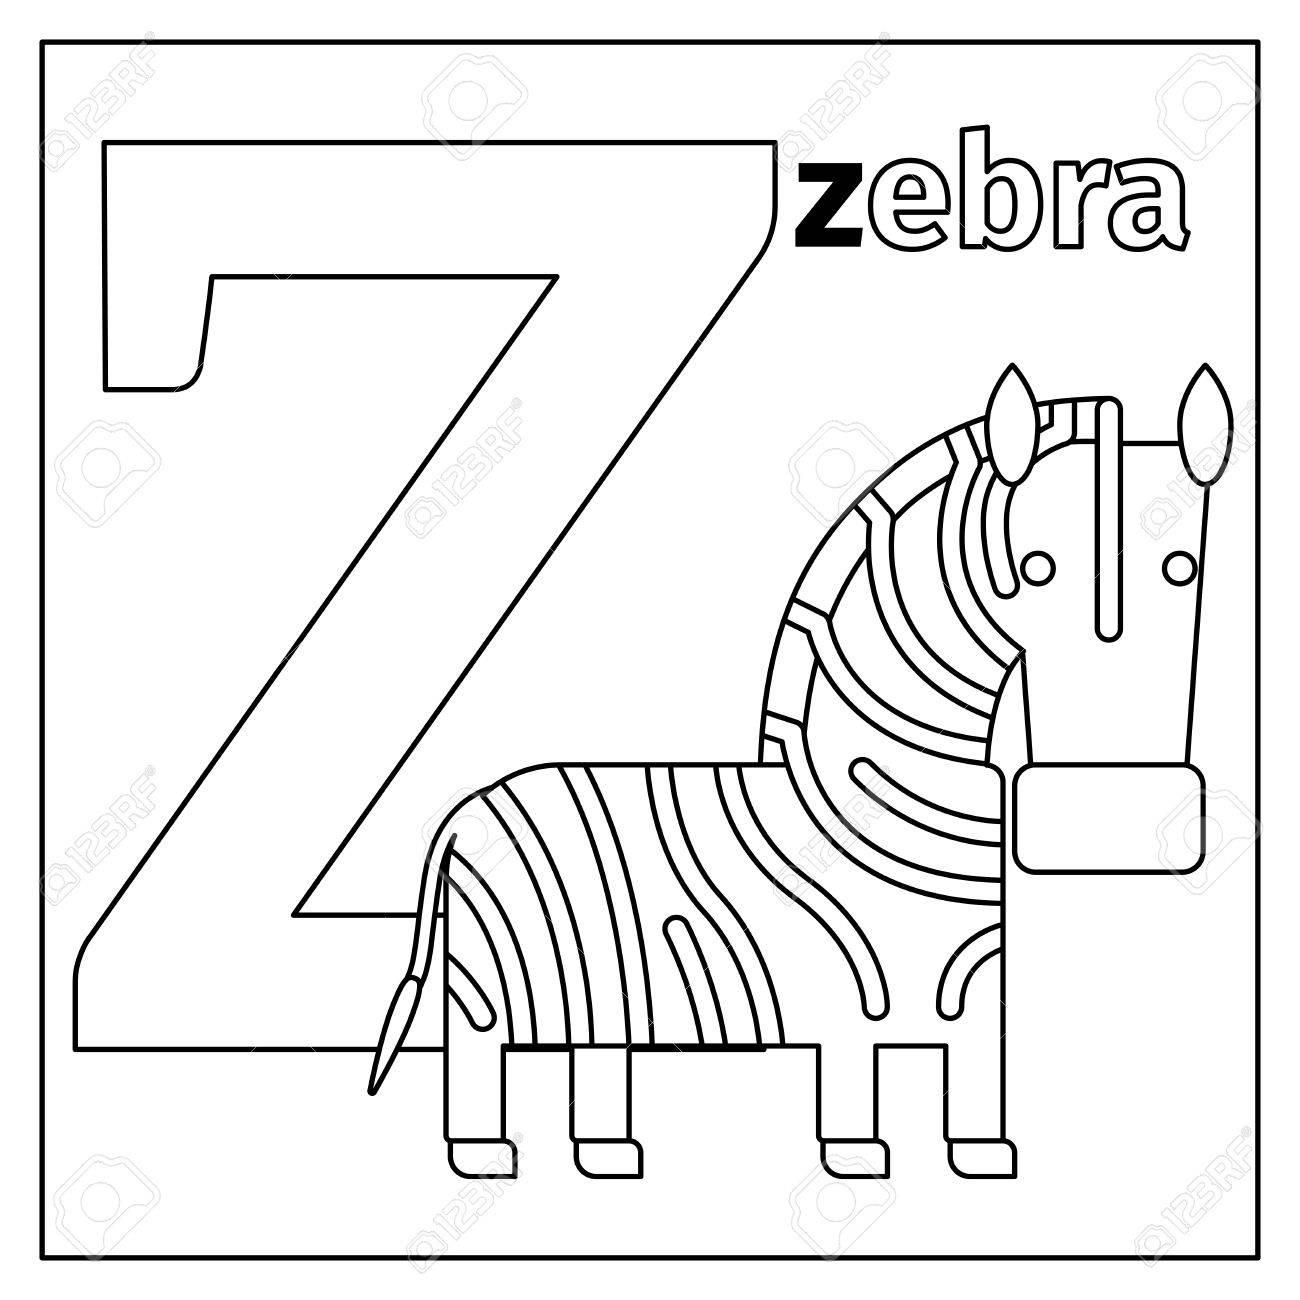 Dibujo Para Colorear O Tarjeta Para Ninos Con Alfabeto Ingles